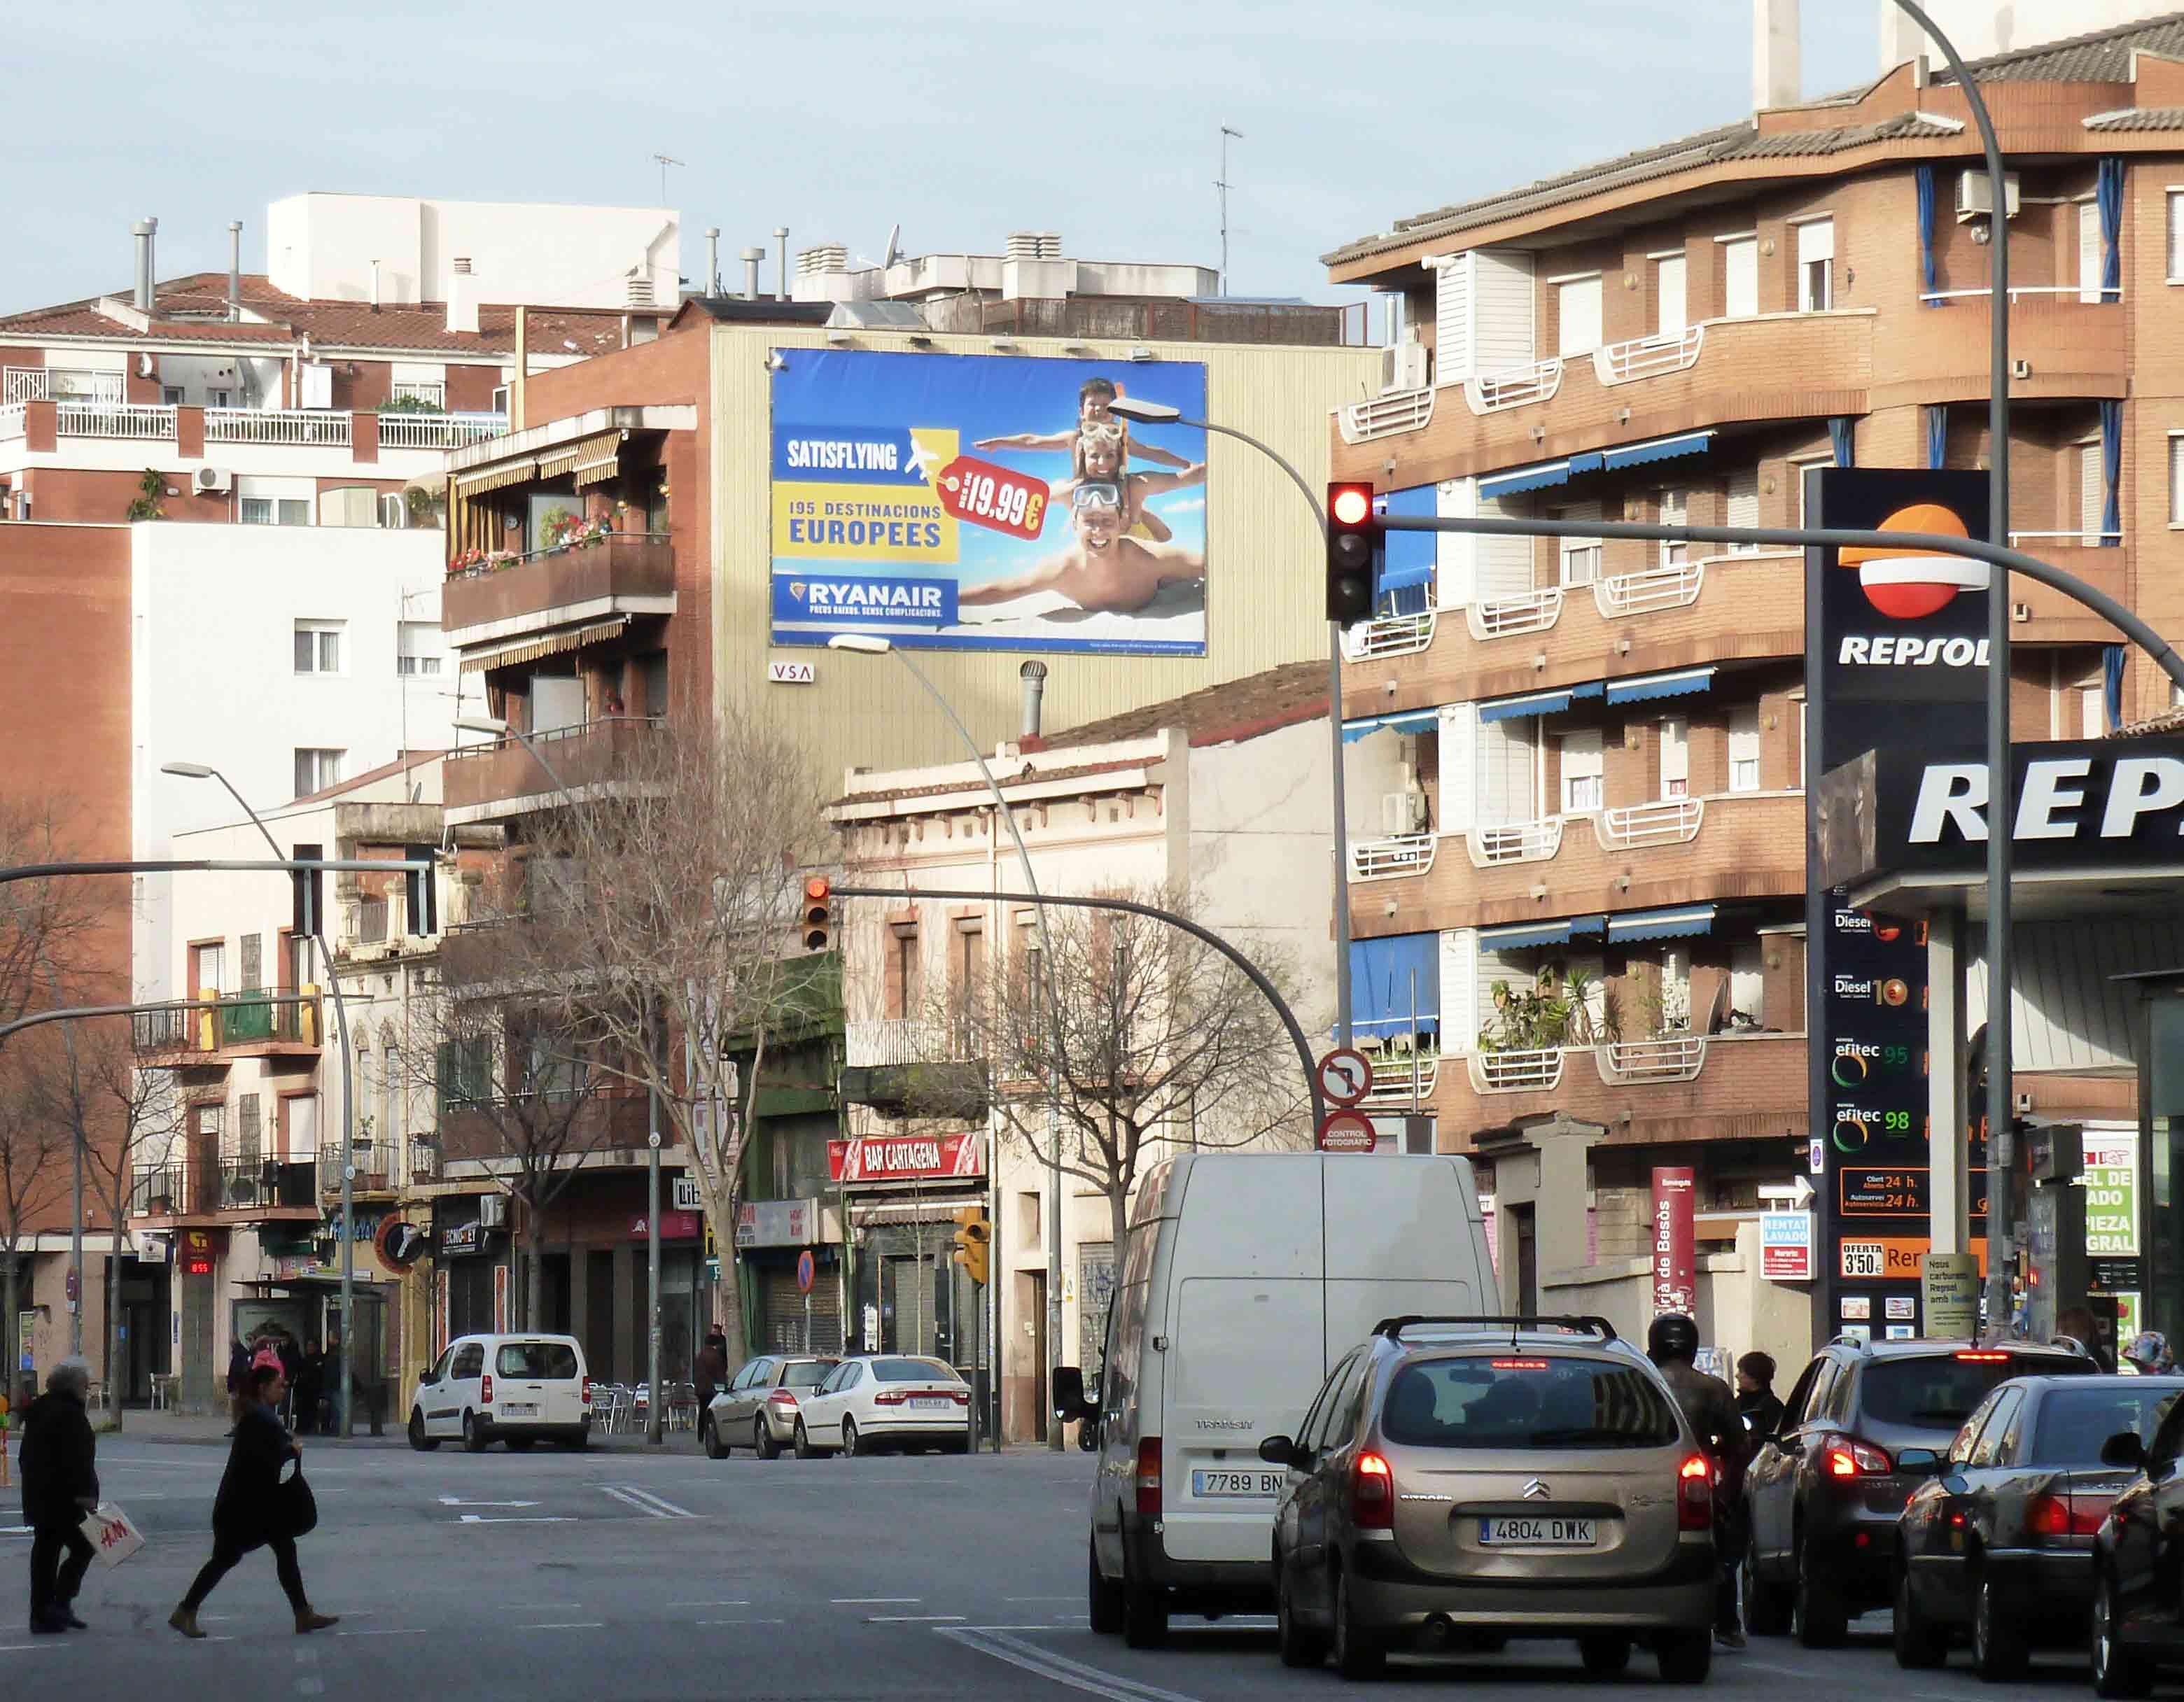 pym-barcelona-pi-i-margall-ryanair-abril-vsa-comunicacion